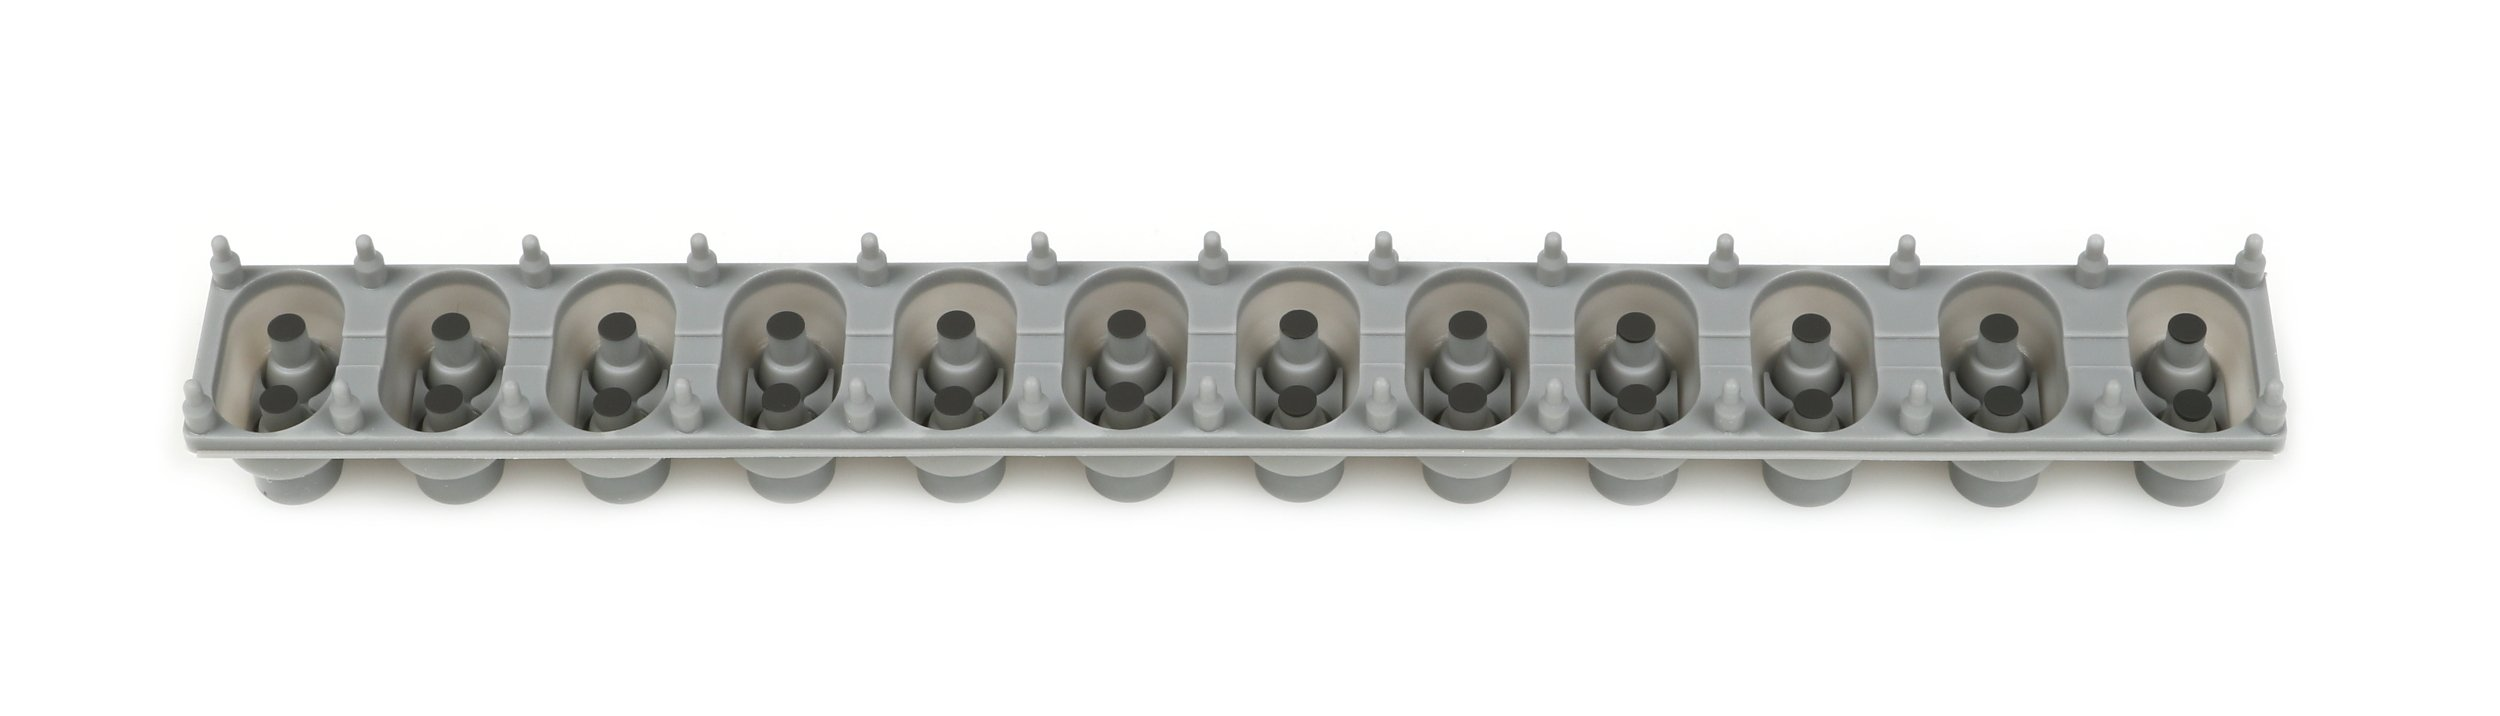 Yamaha WB16880R MOTIF XF6 12-Key Contact Strip | Full